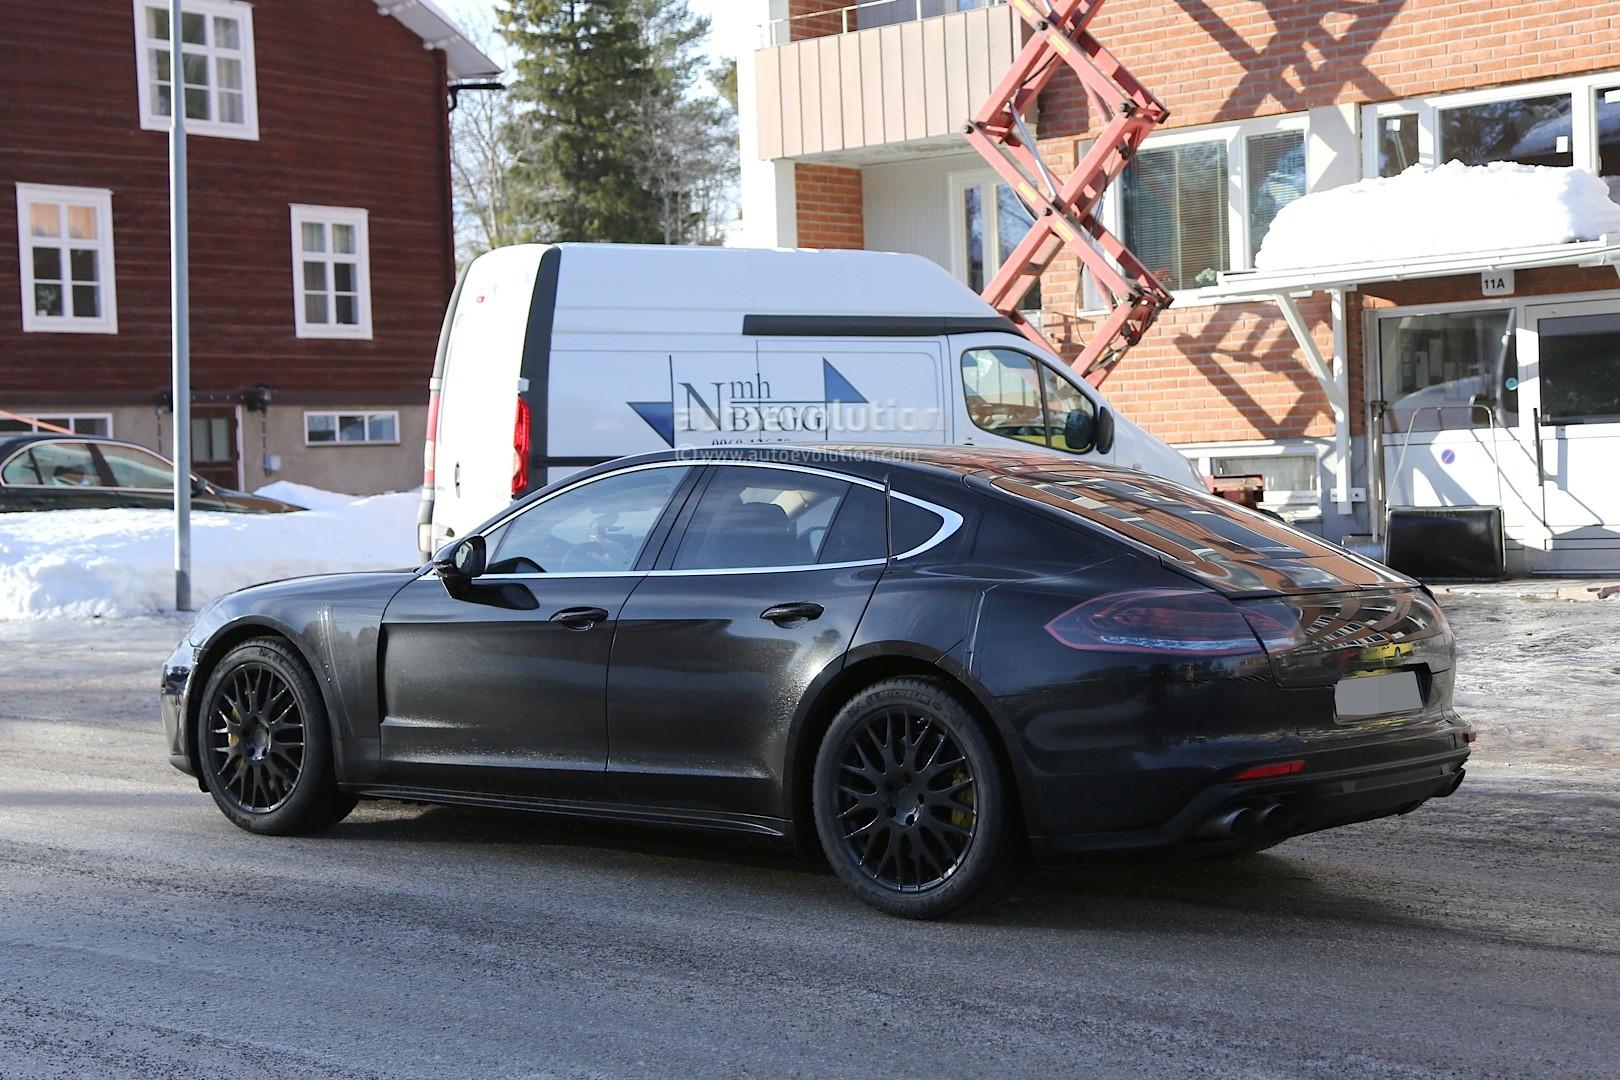 2016 - [Porsche] Panamera II - Page 3 Spyshots-2017-porsche-panamera-first-interior-photos-show-big-changes_15